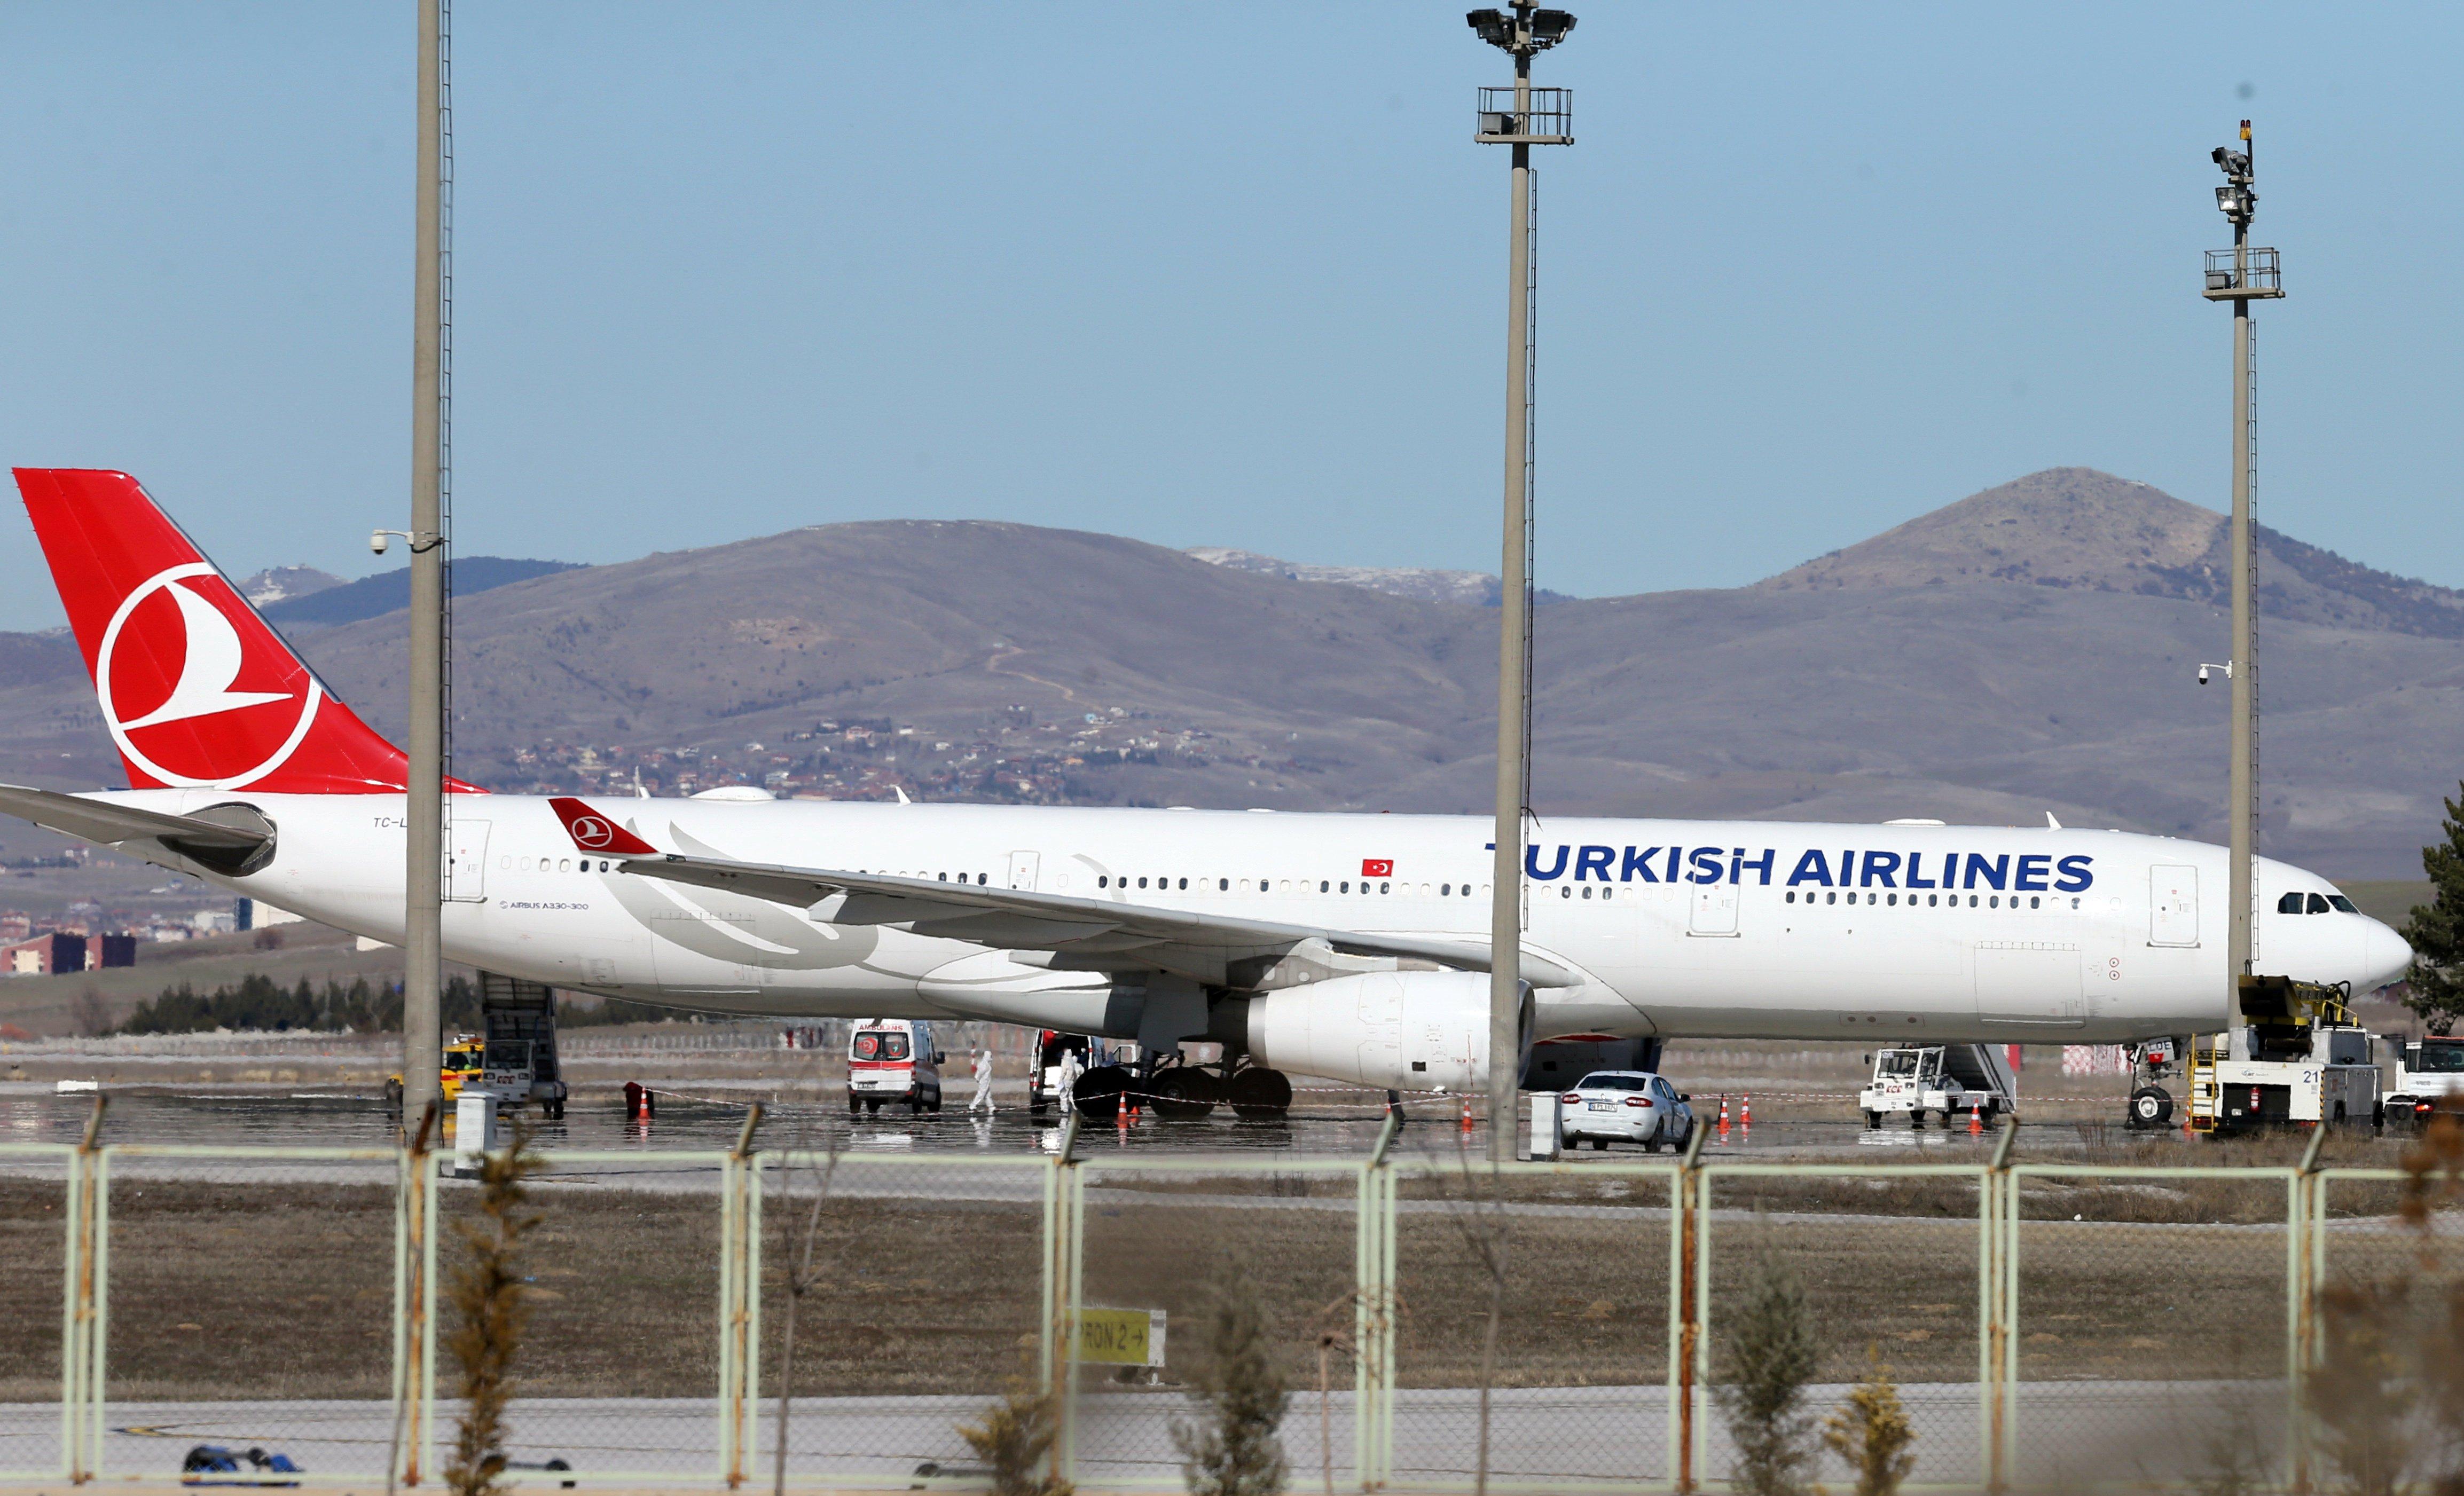 Turkish Airlines Suspends Nakhchivan Flights Reduces Travel To Seoul Amid Coronavirus Measures Daily Sabah